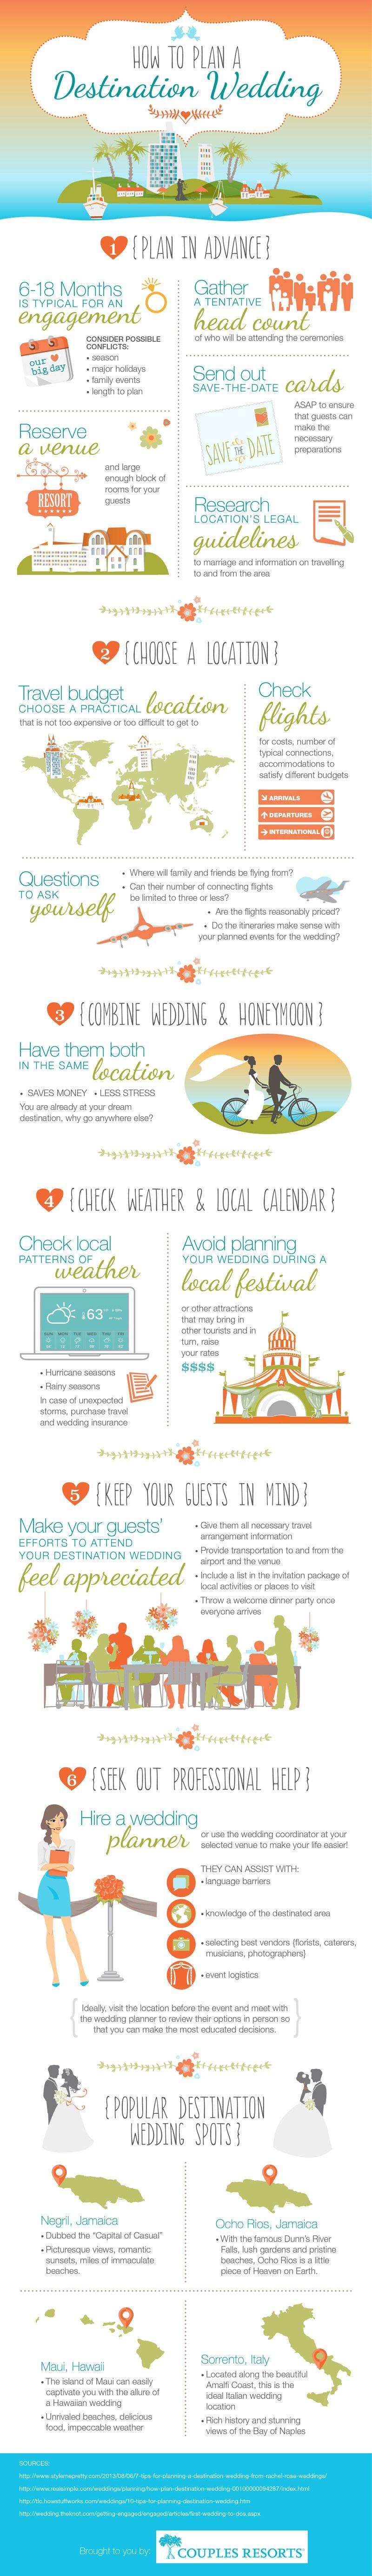 how to plan a destination wedding infographics lightscap3scom